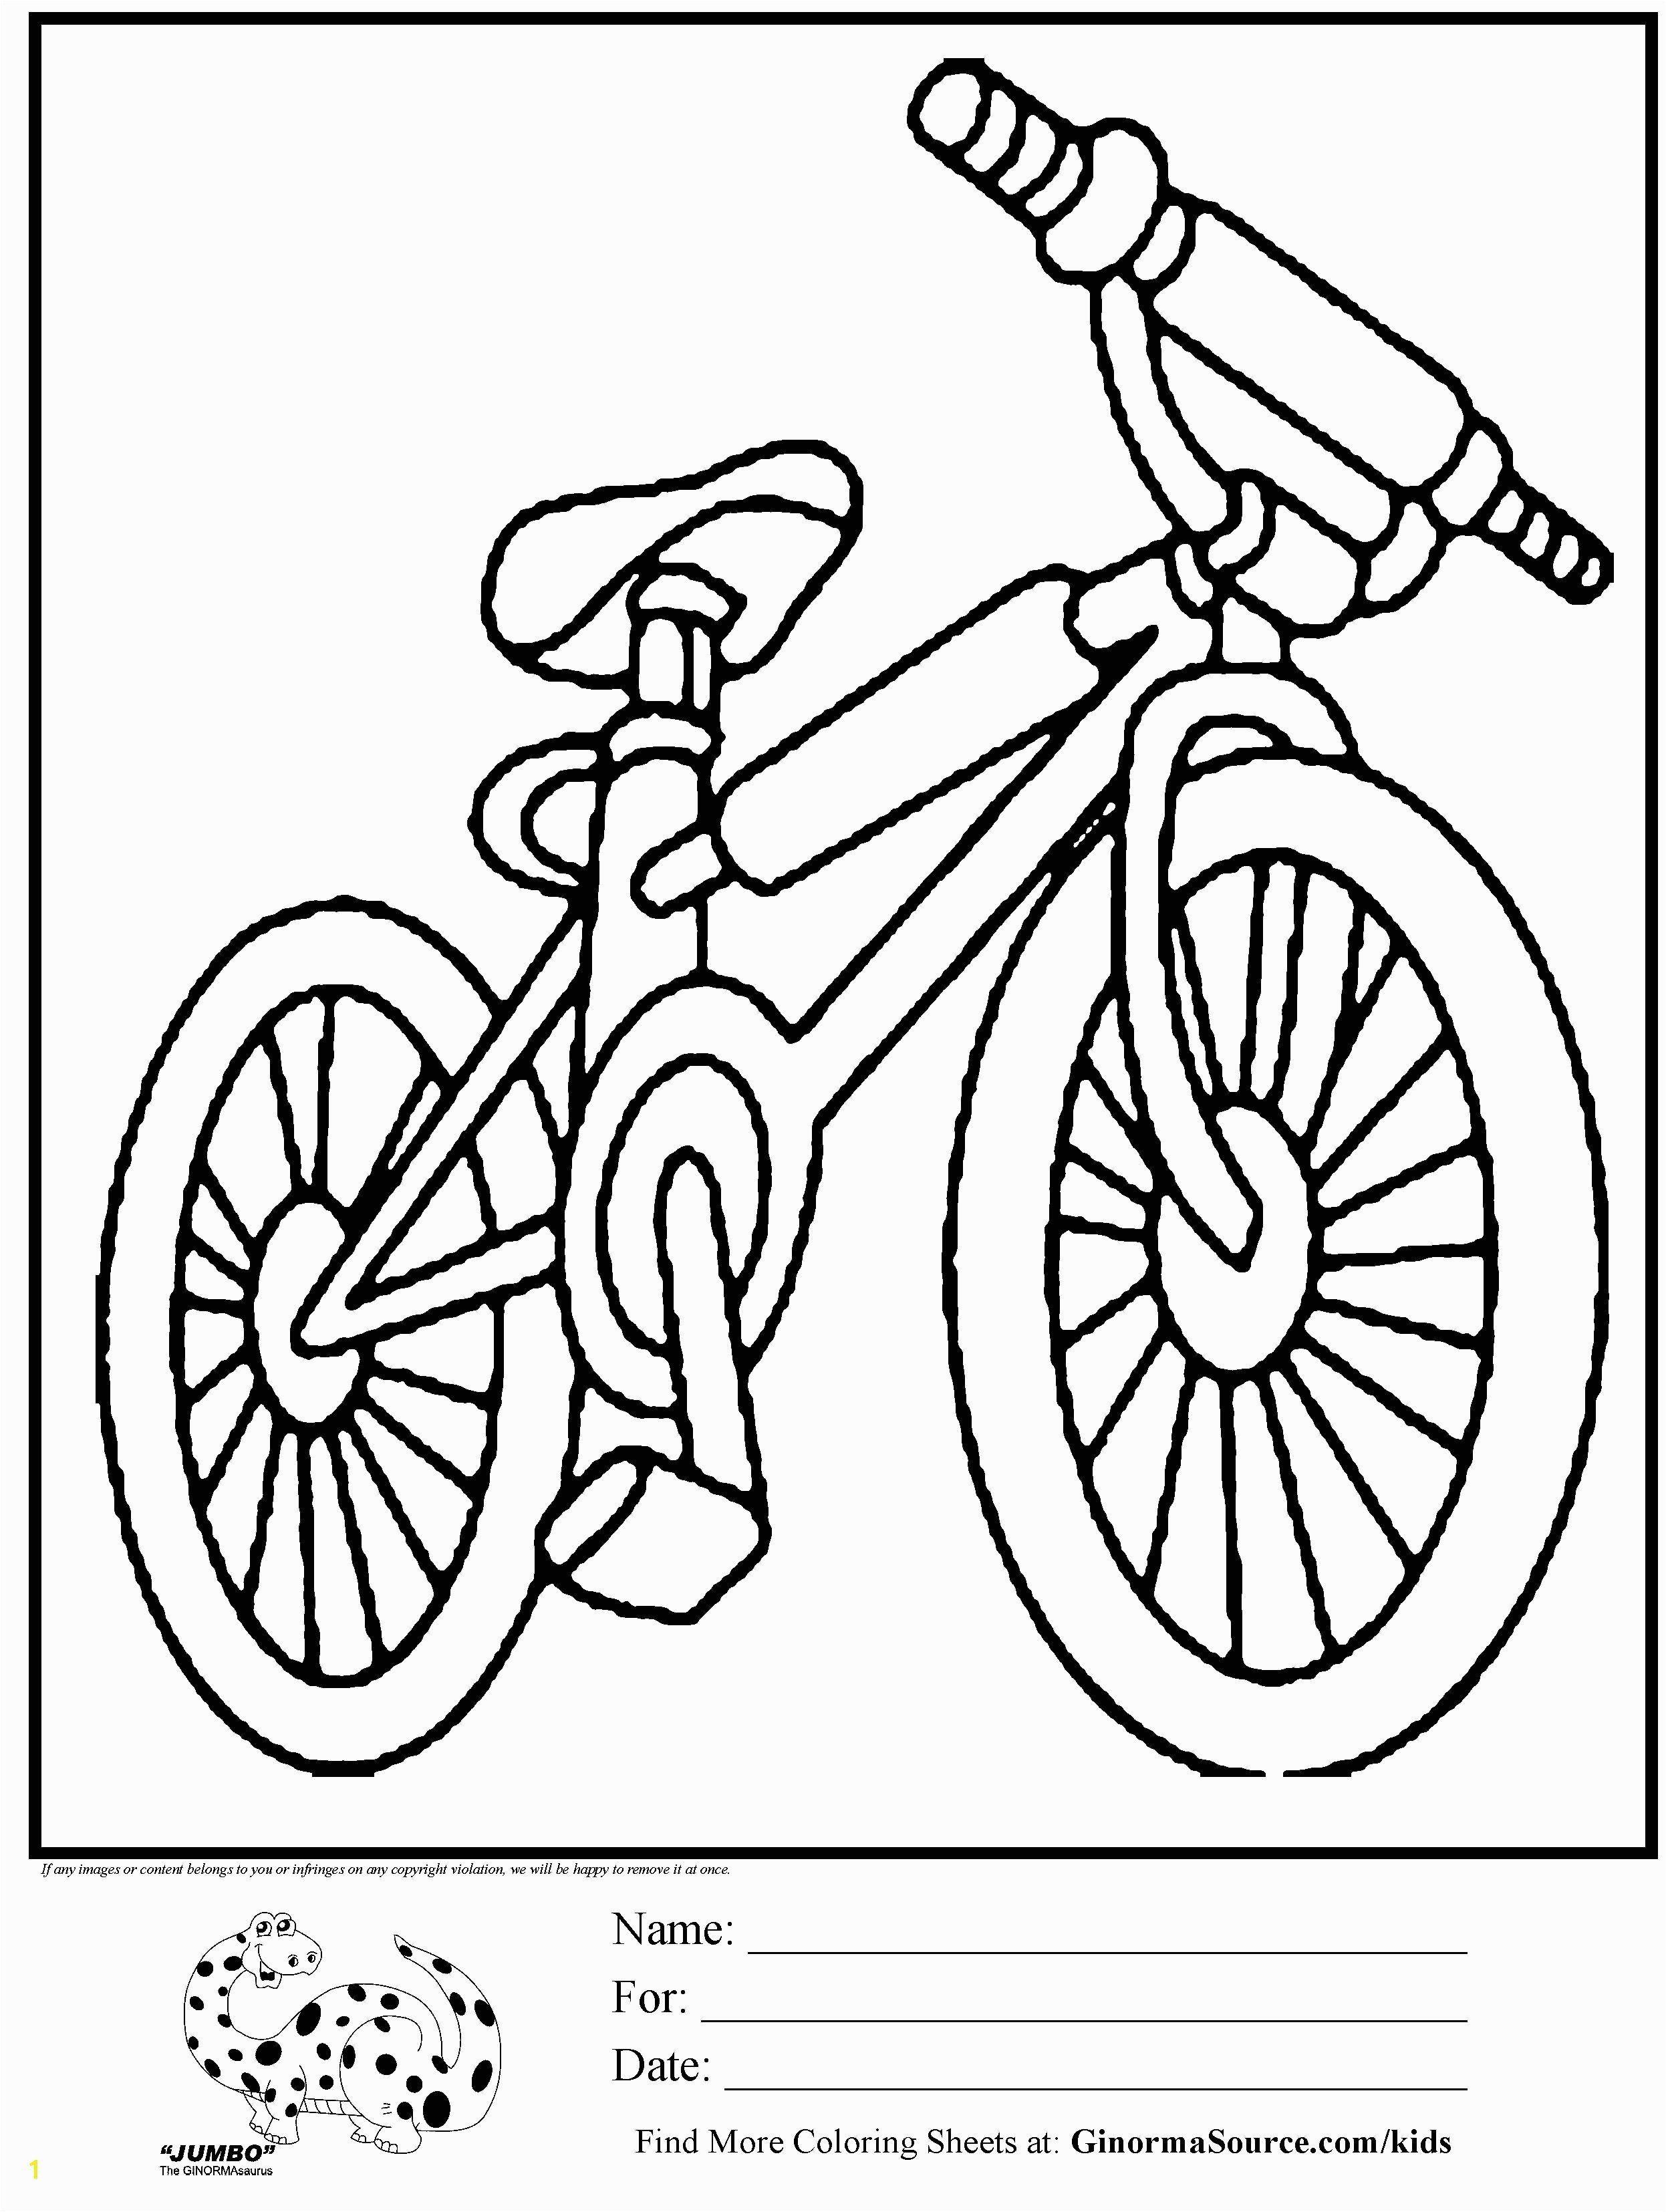 Dirt Bike Coloring Pages Best Of Dirt Bike To Color Luxury Bike Coloring Pages Best Gambar Anak Teknik